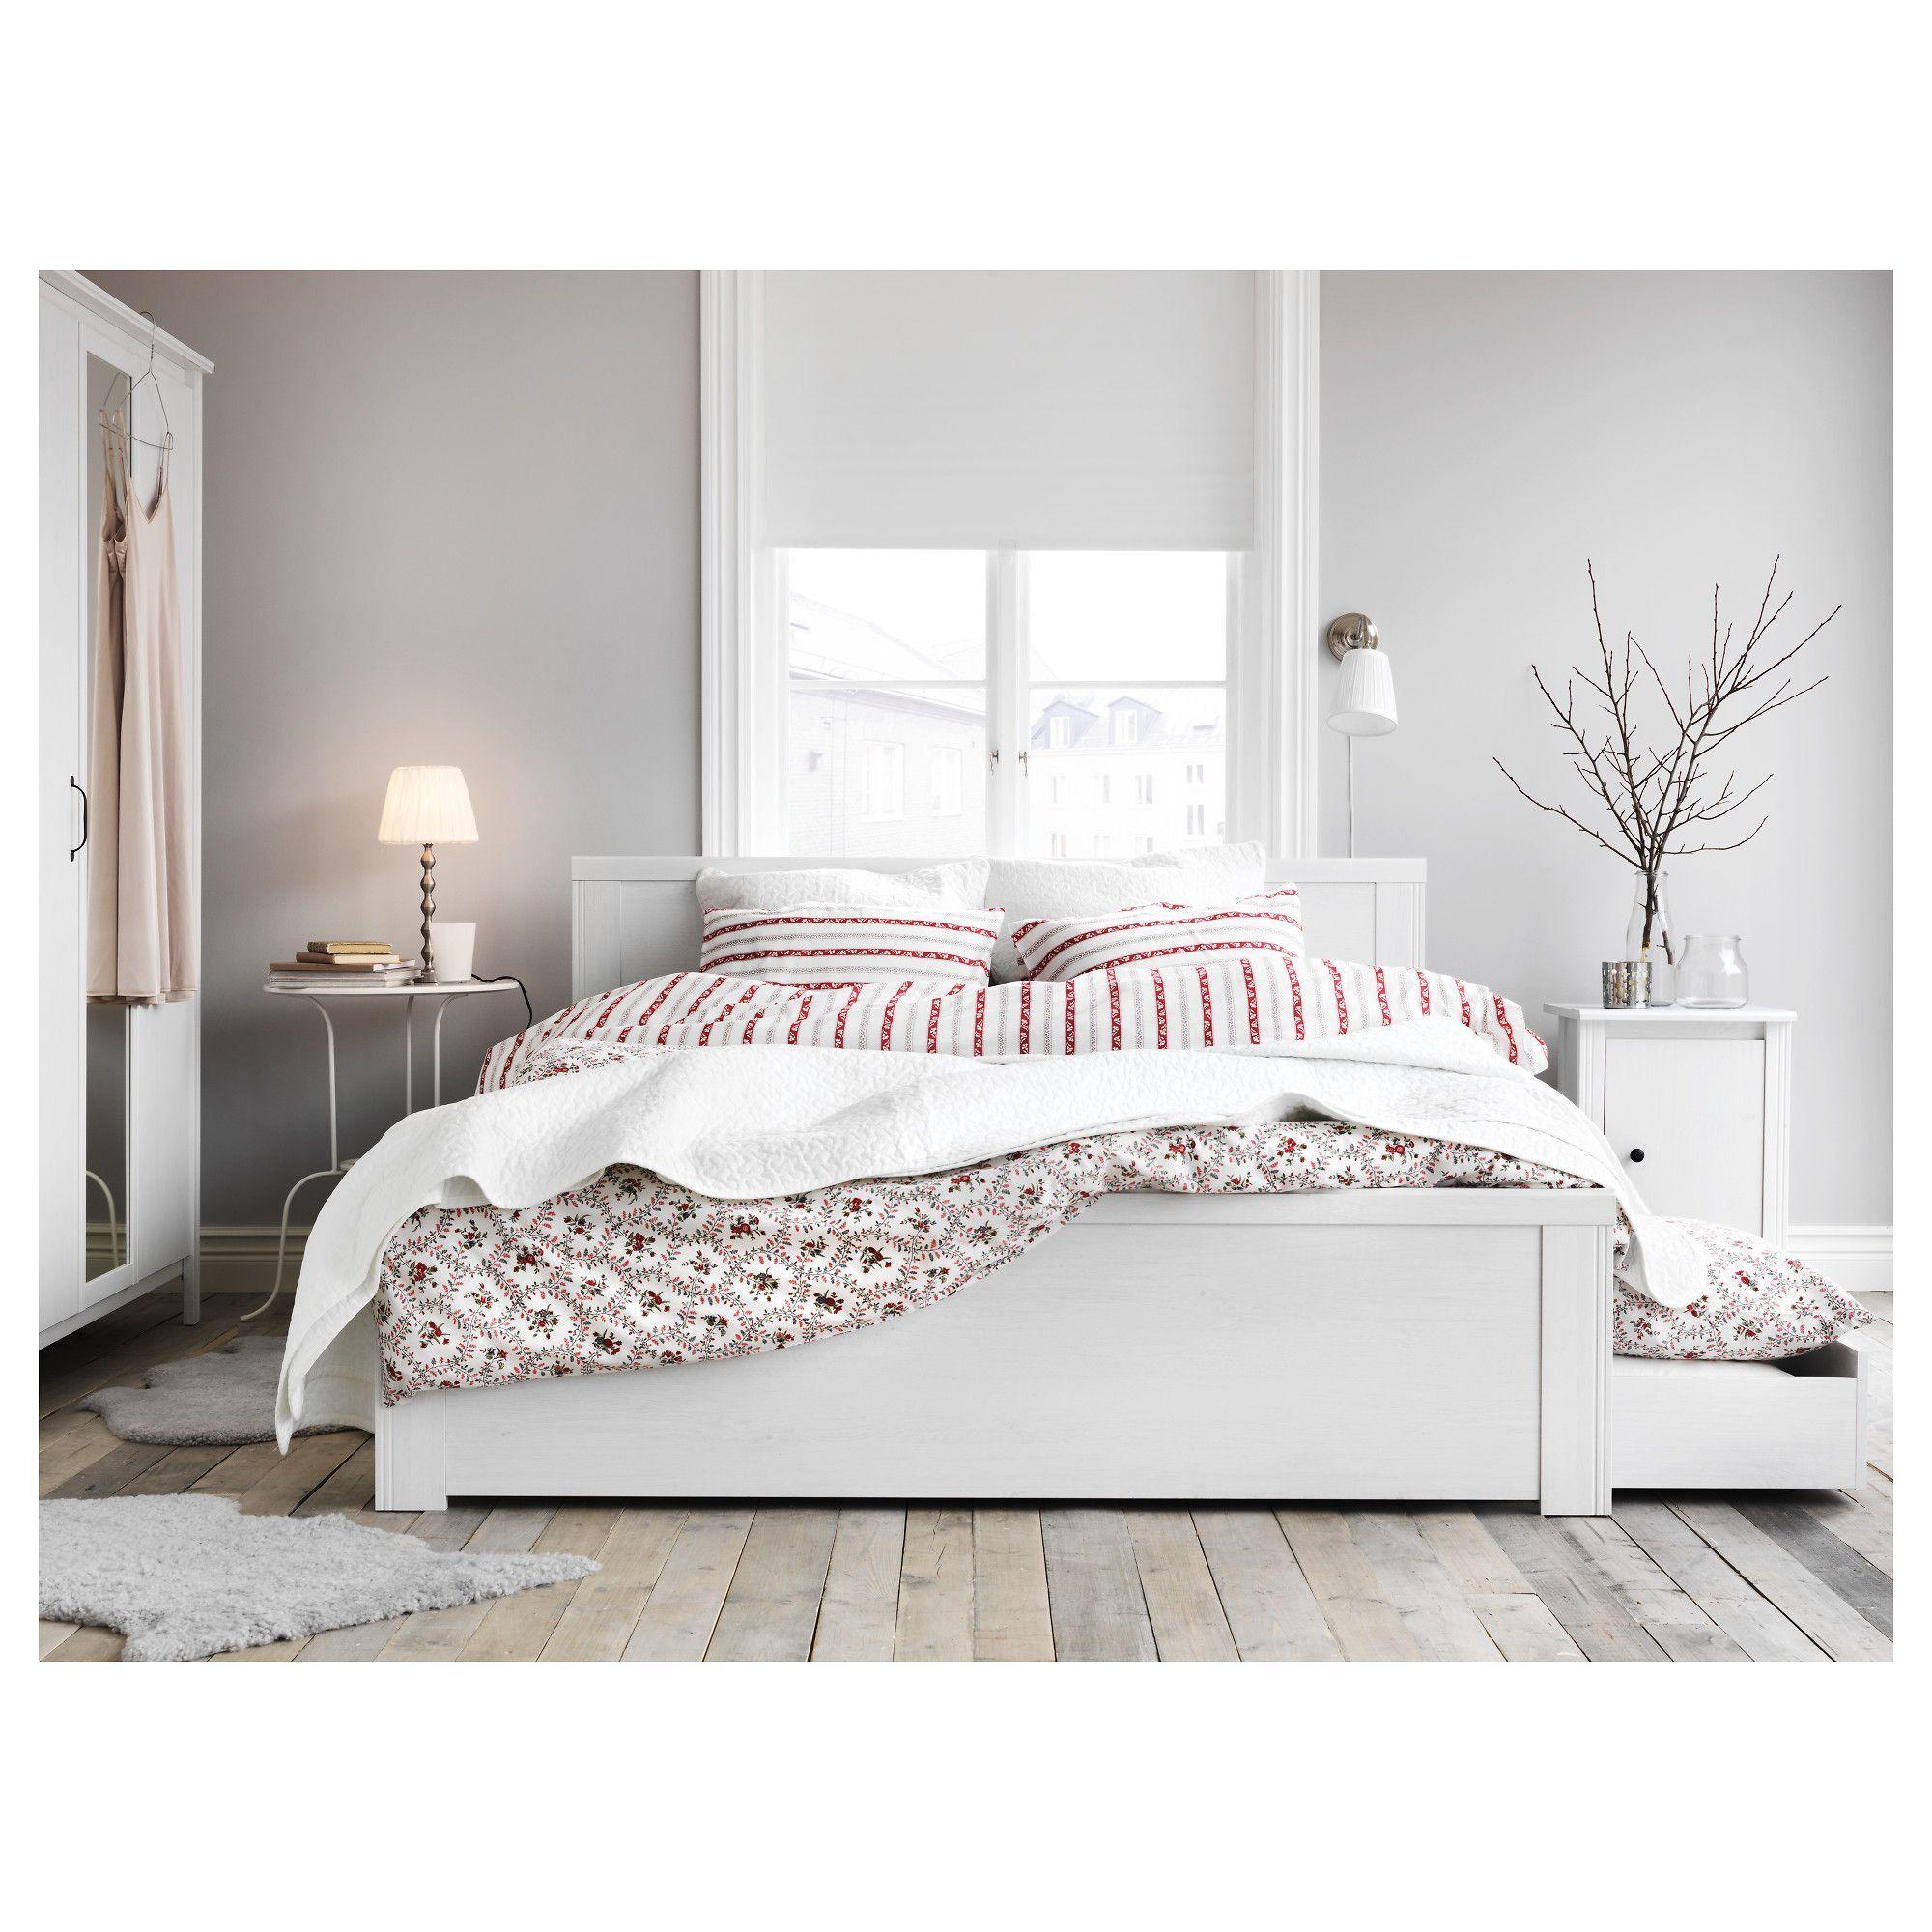 Ikea Brusali Bed Frame With 4 Storage Boxes Doublebedframe Camas Dormitorios Camas Matrimoniales